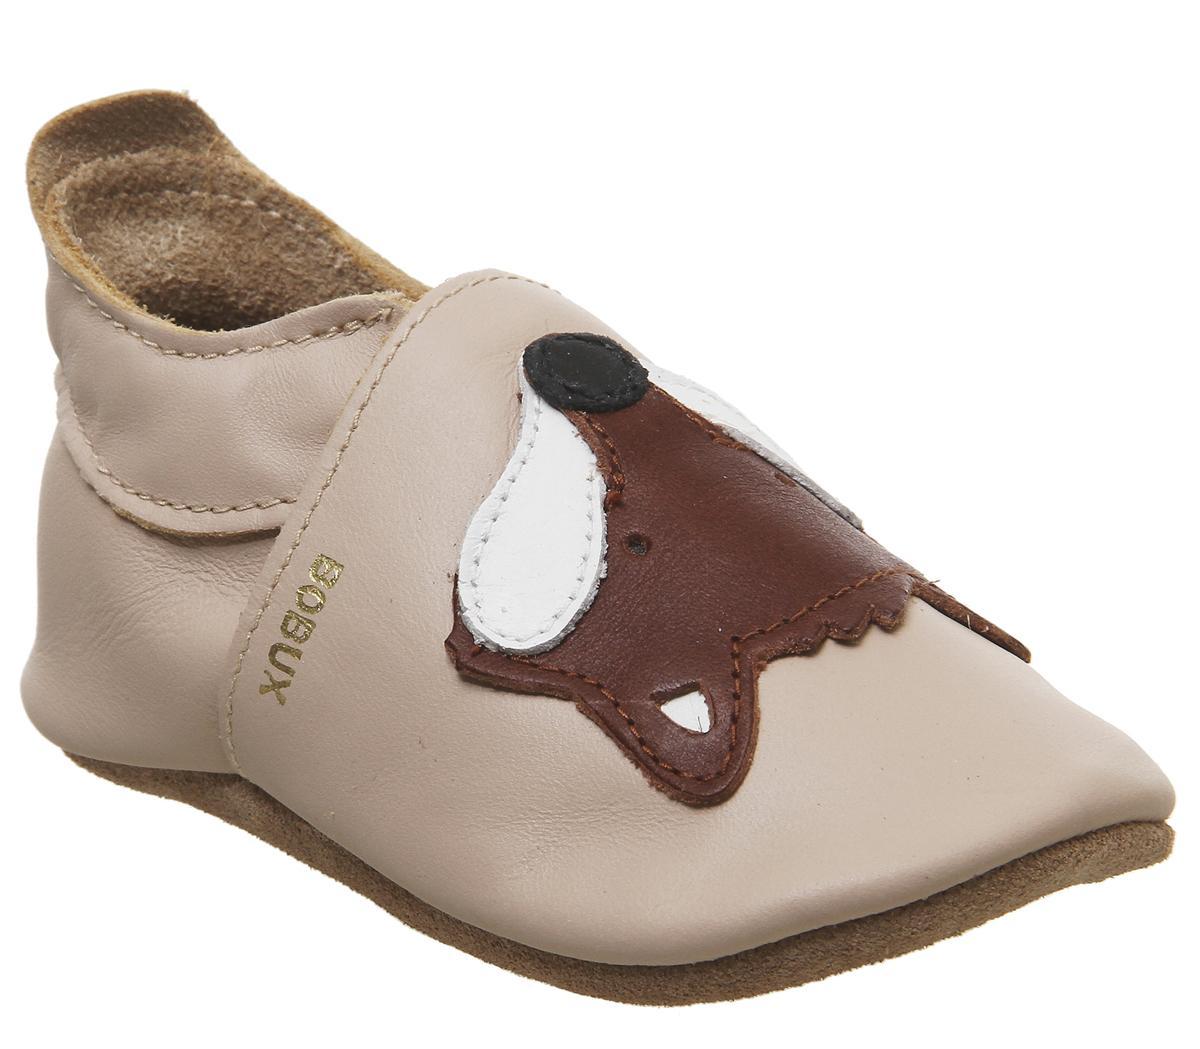 Soft Sole Crib Shoes